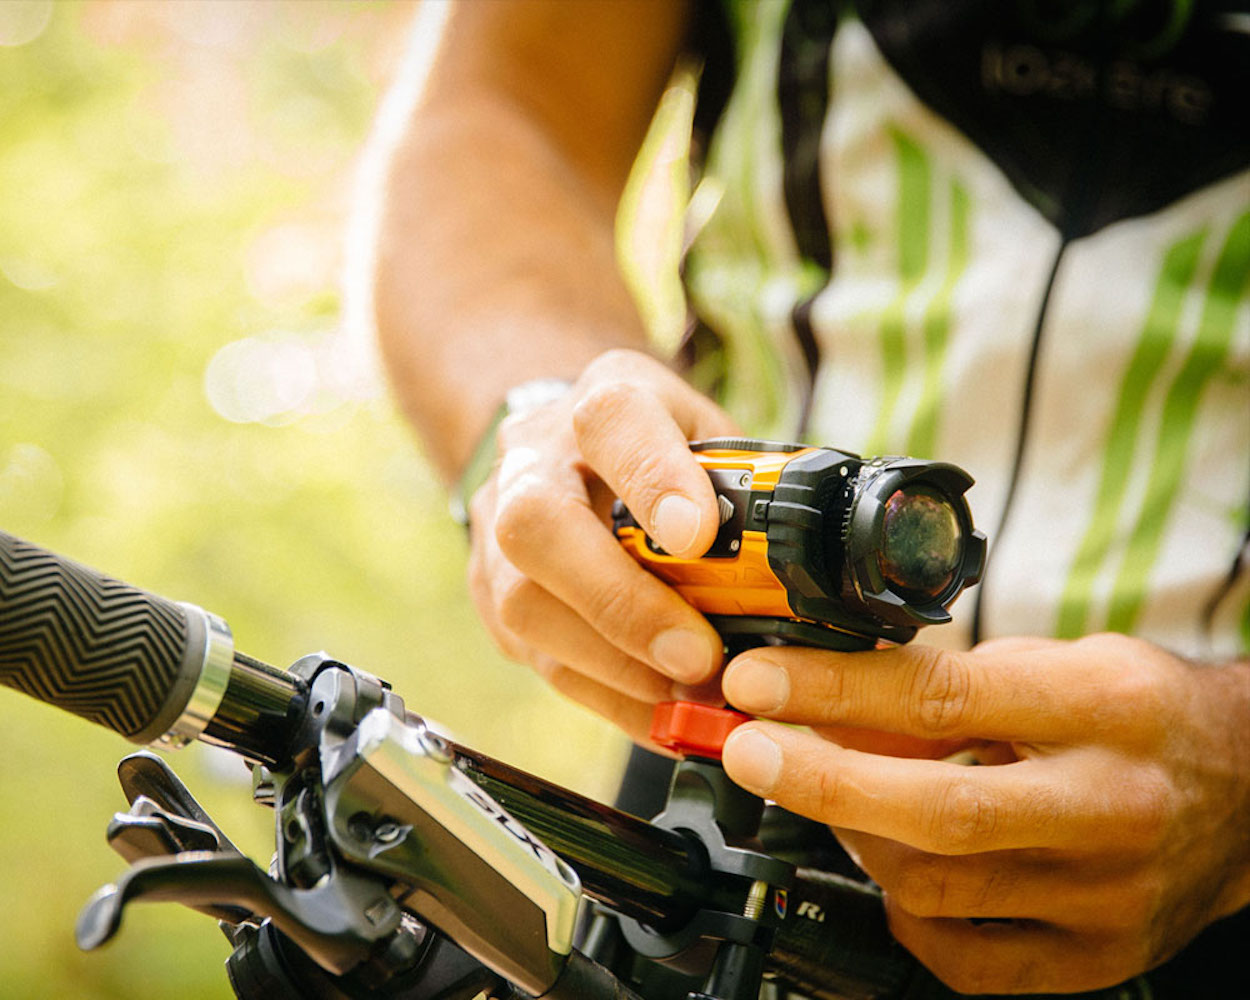 Ricoh WG-M1 Waterproof Action Camera